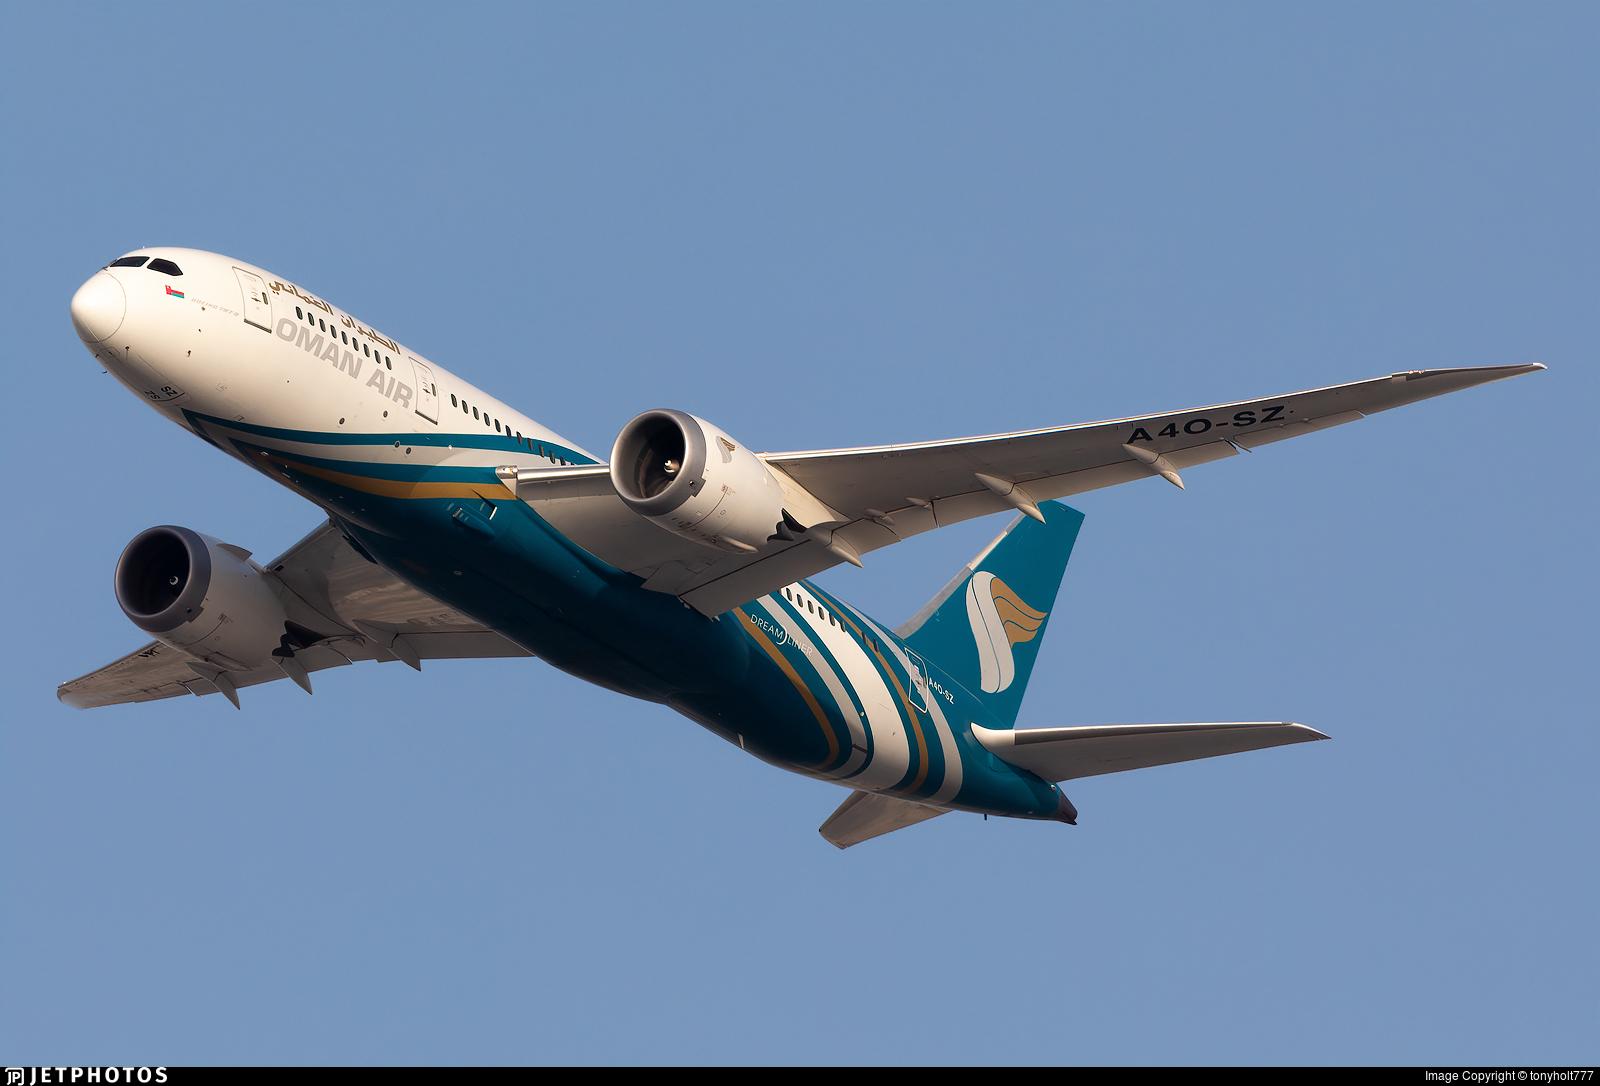 A4O-SZ - Boeing 787-8 Dreamliner - Oman Air